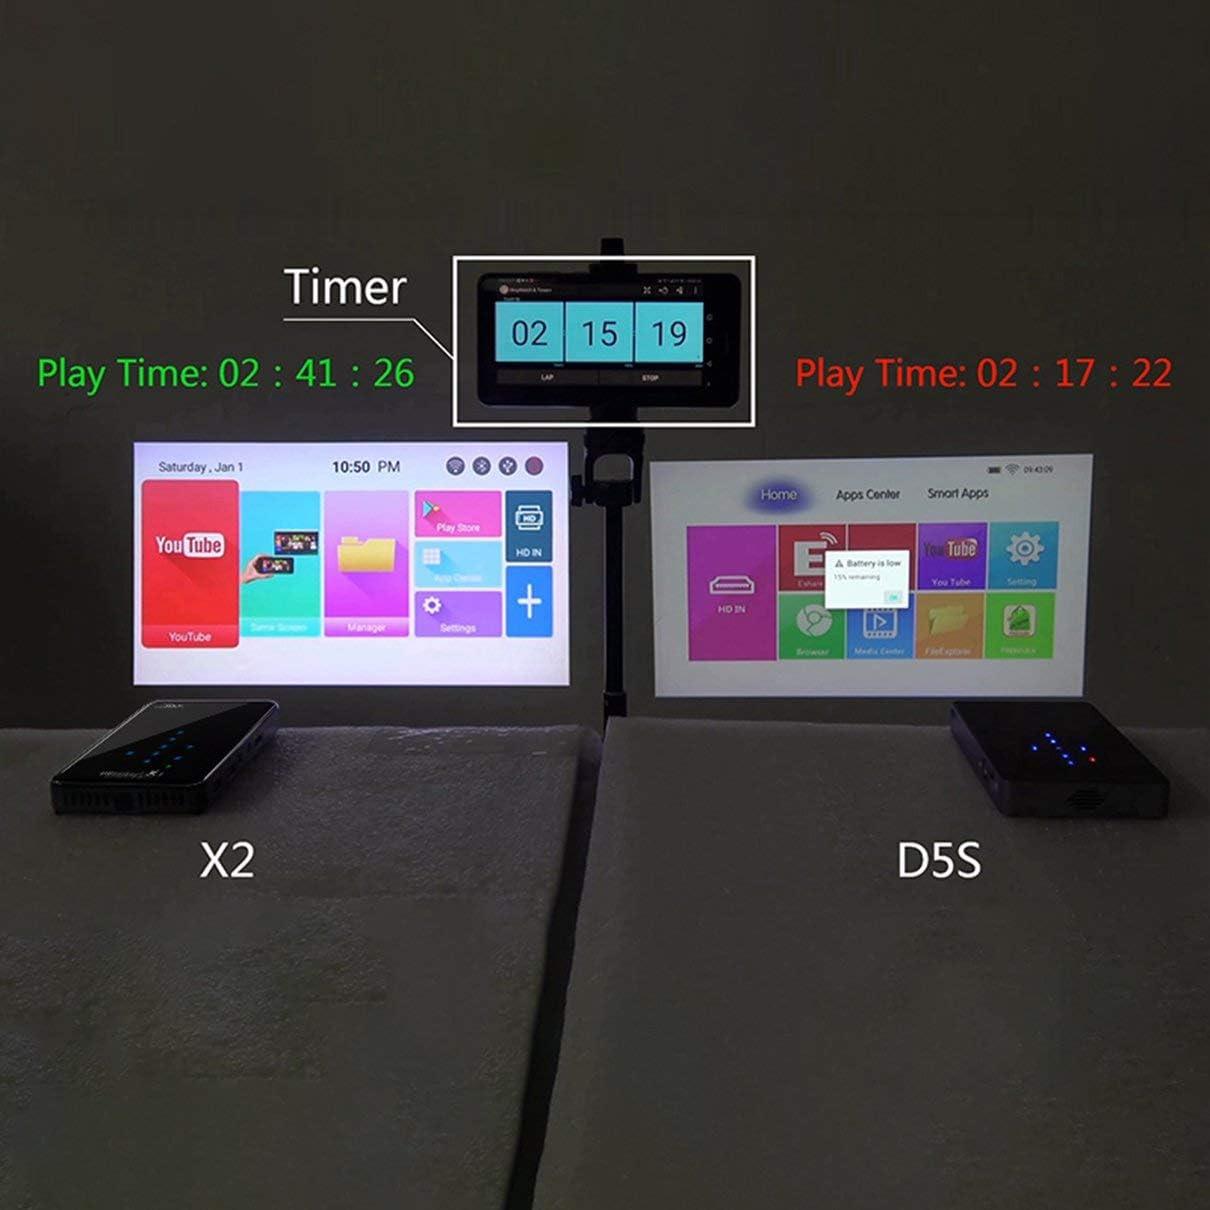 Mini proyector AUN X2 WI-FI RAM Opcional: 2G Memoria incorporada ...